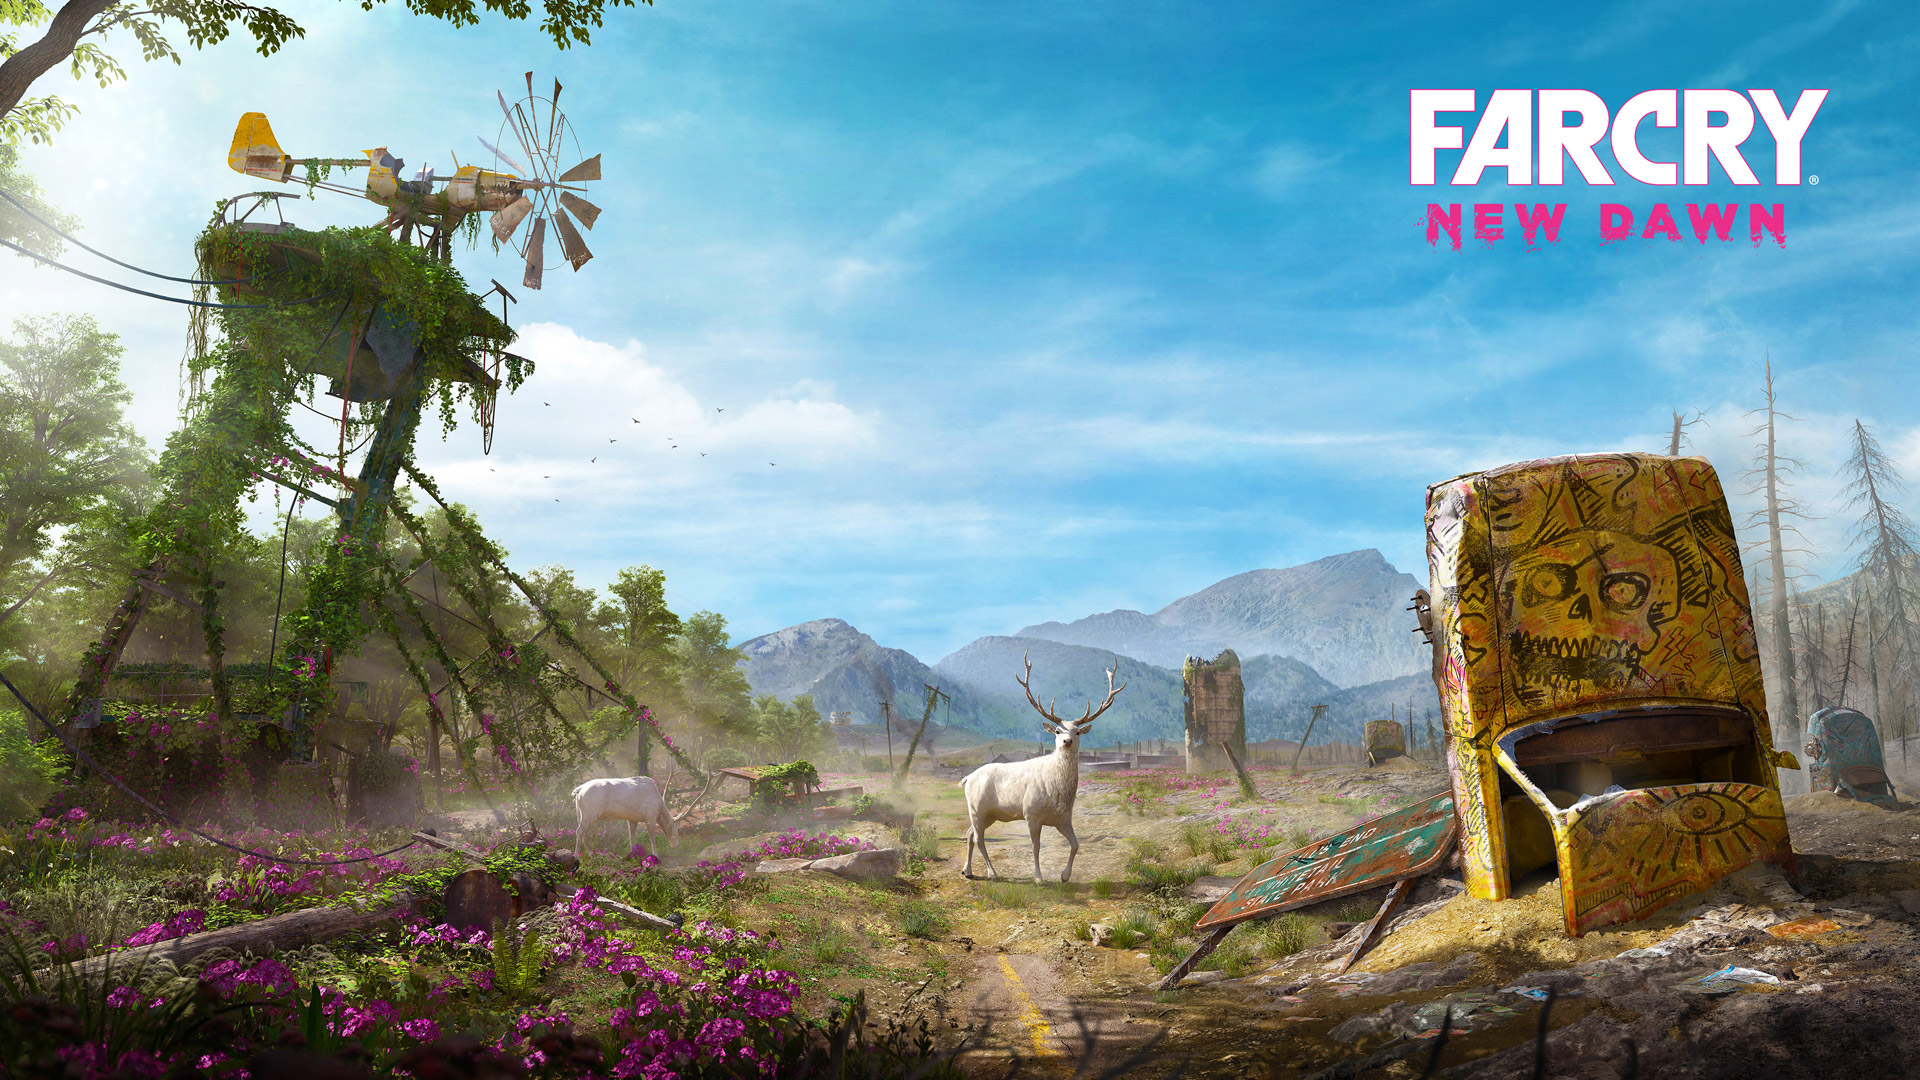 Free Far Cry: New Dawn Wallpaper in 1920x1080